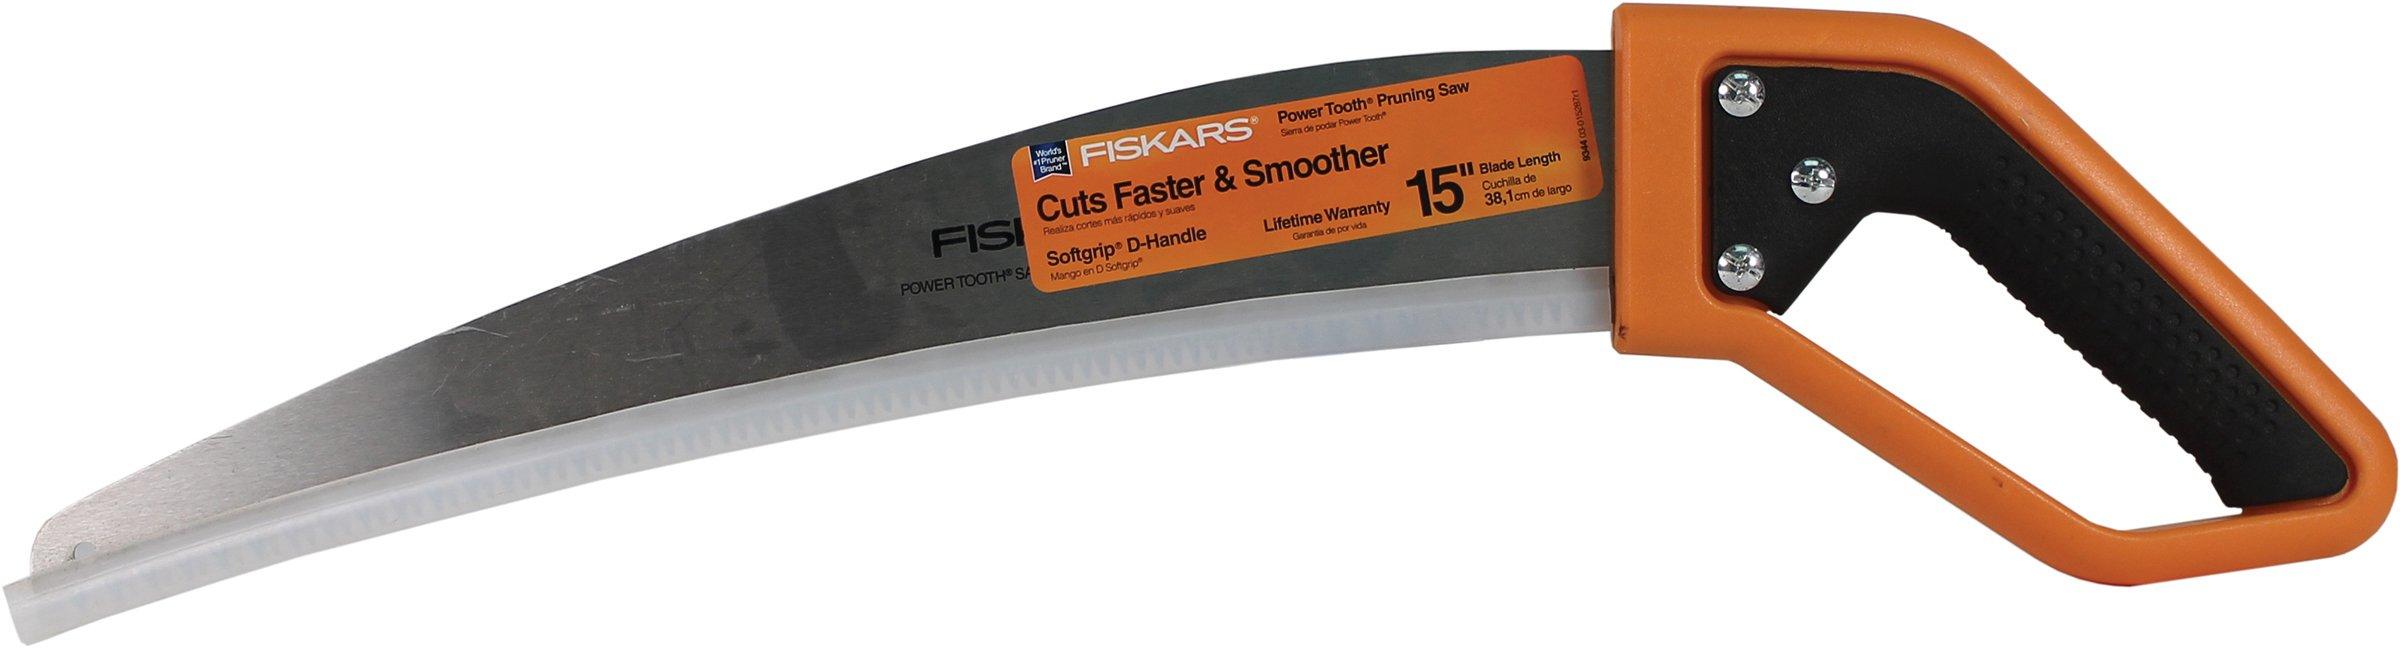 Fiskars 15 Inch Pruning Saw with Handle by Fiskars